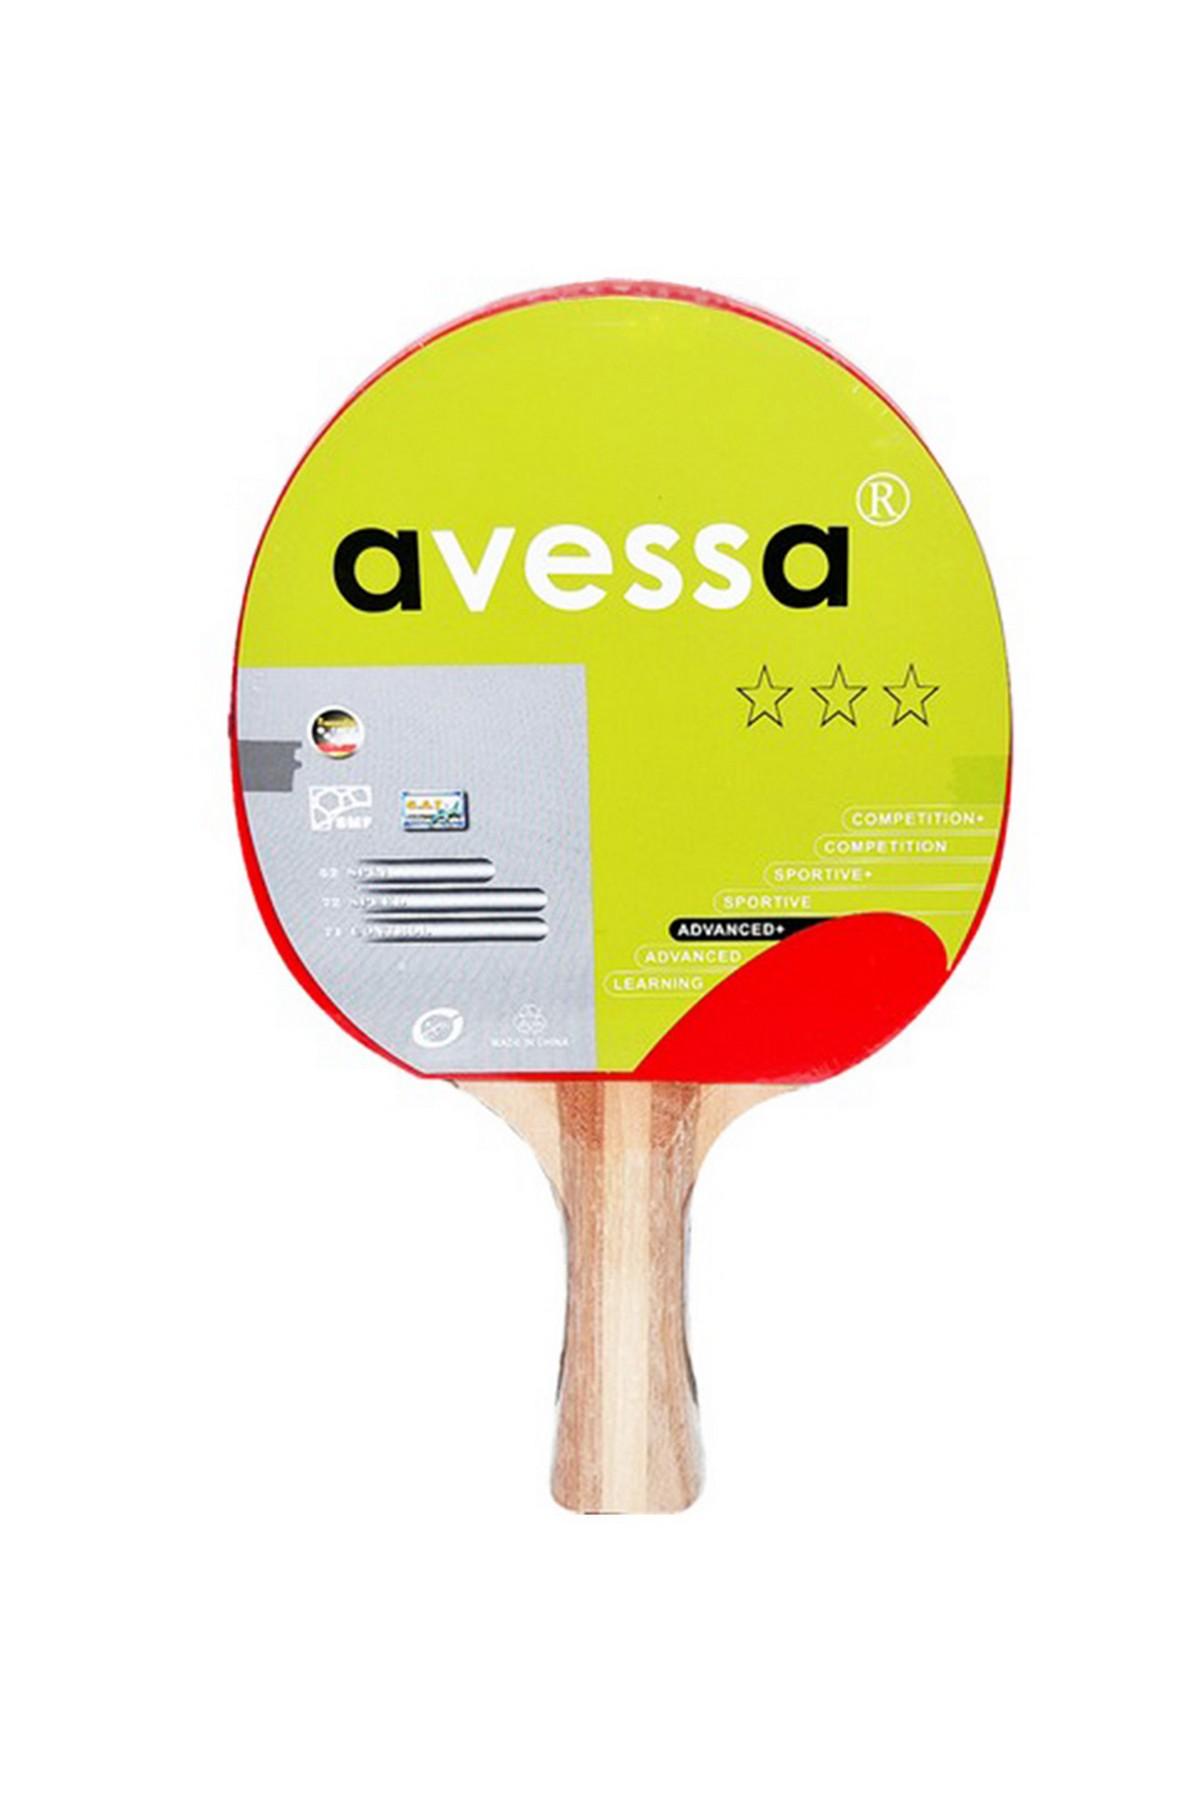 Avessa Advanced Masa Tenis Raketi 3 yıldızlı (RAK300)